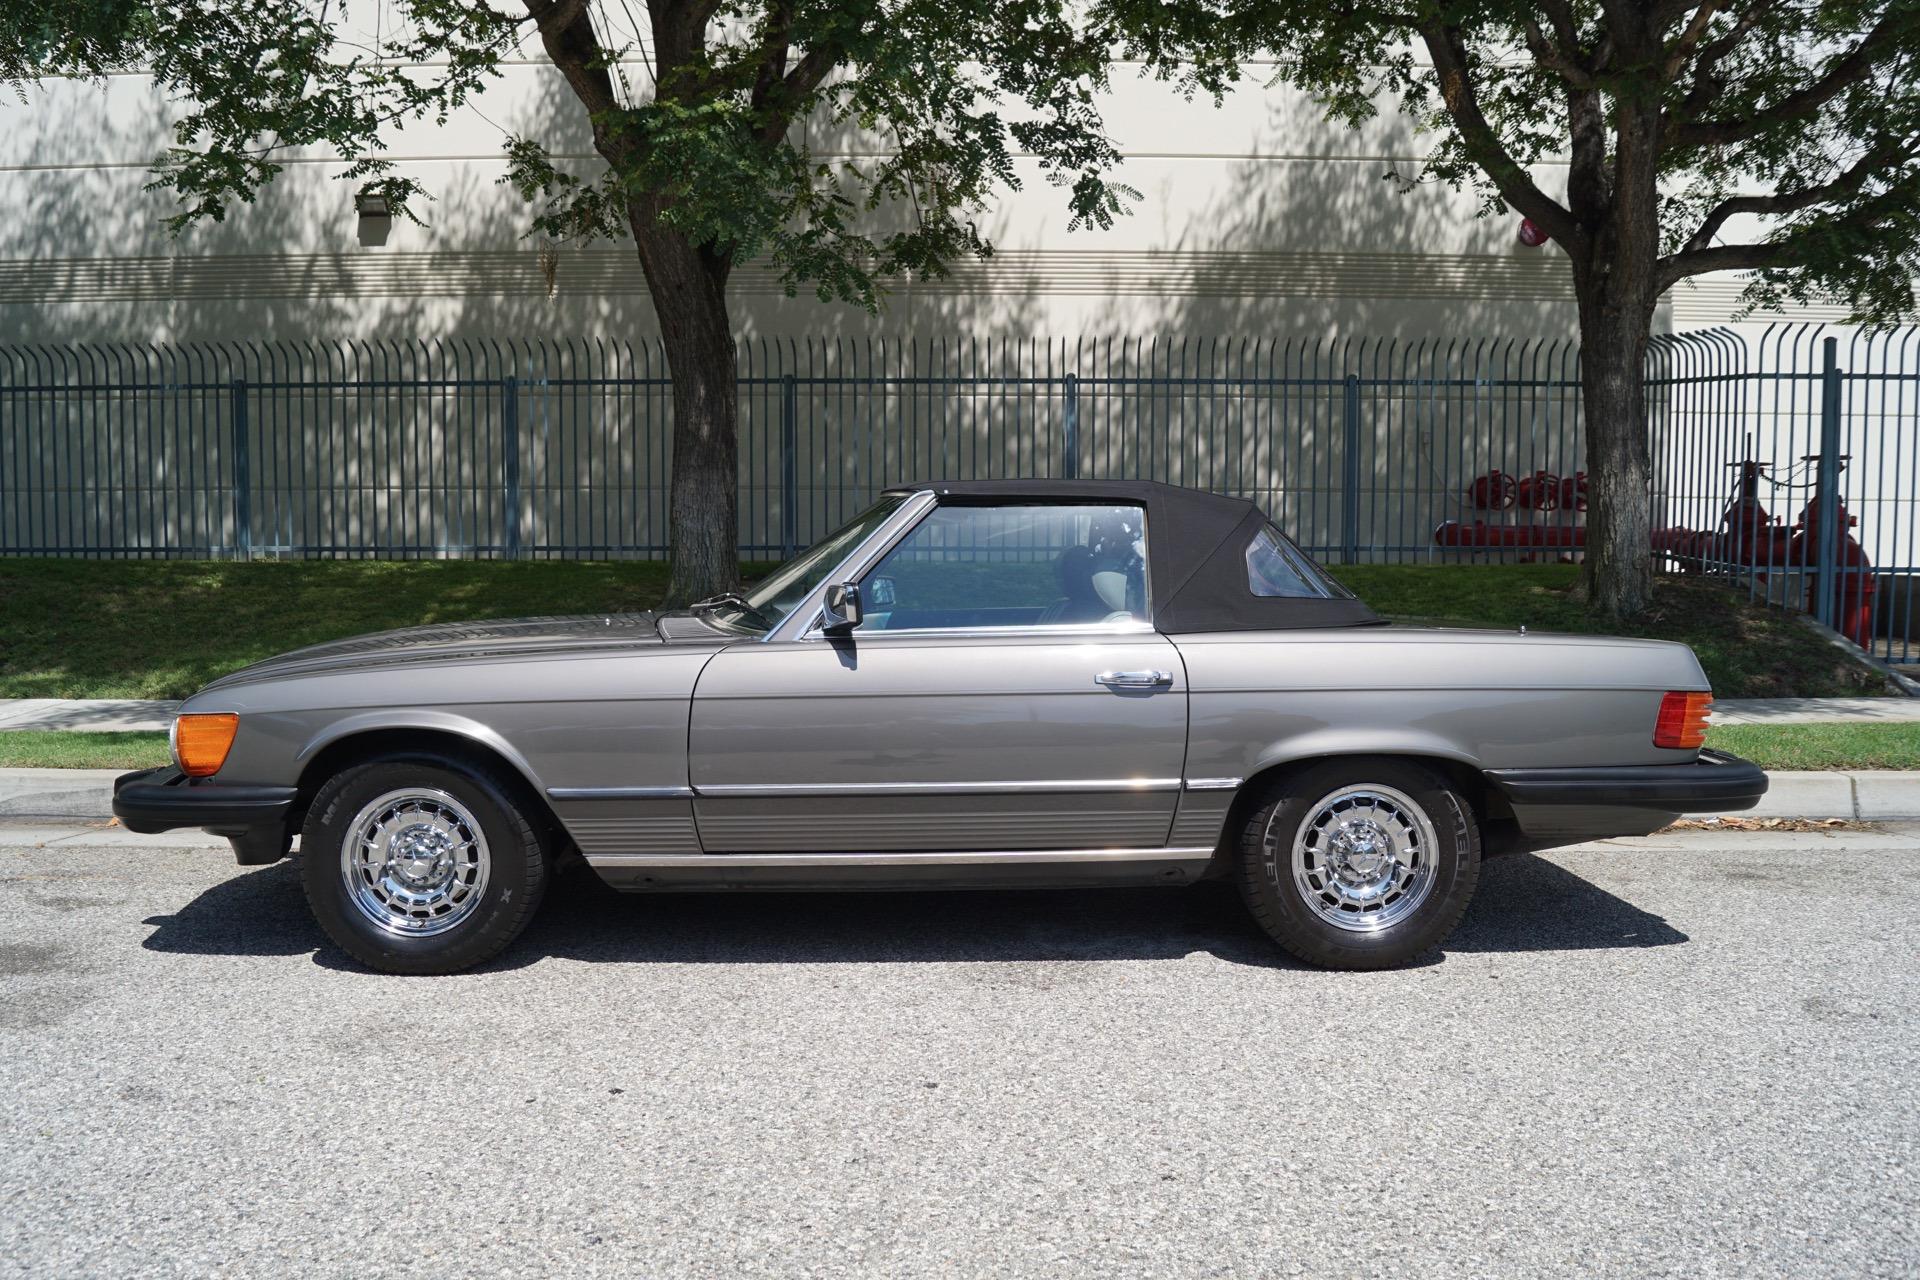 1985 mercedes benz 380 class for sale for 1985 mercedes benz